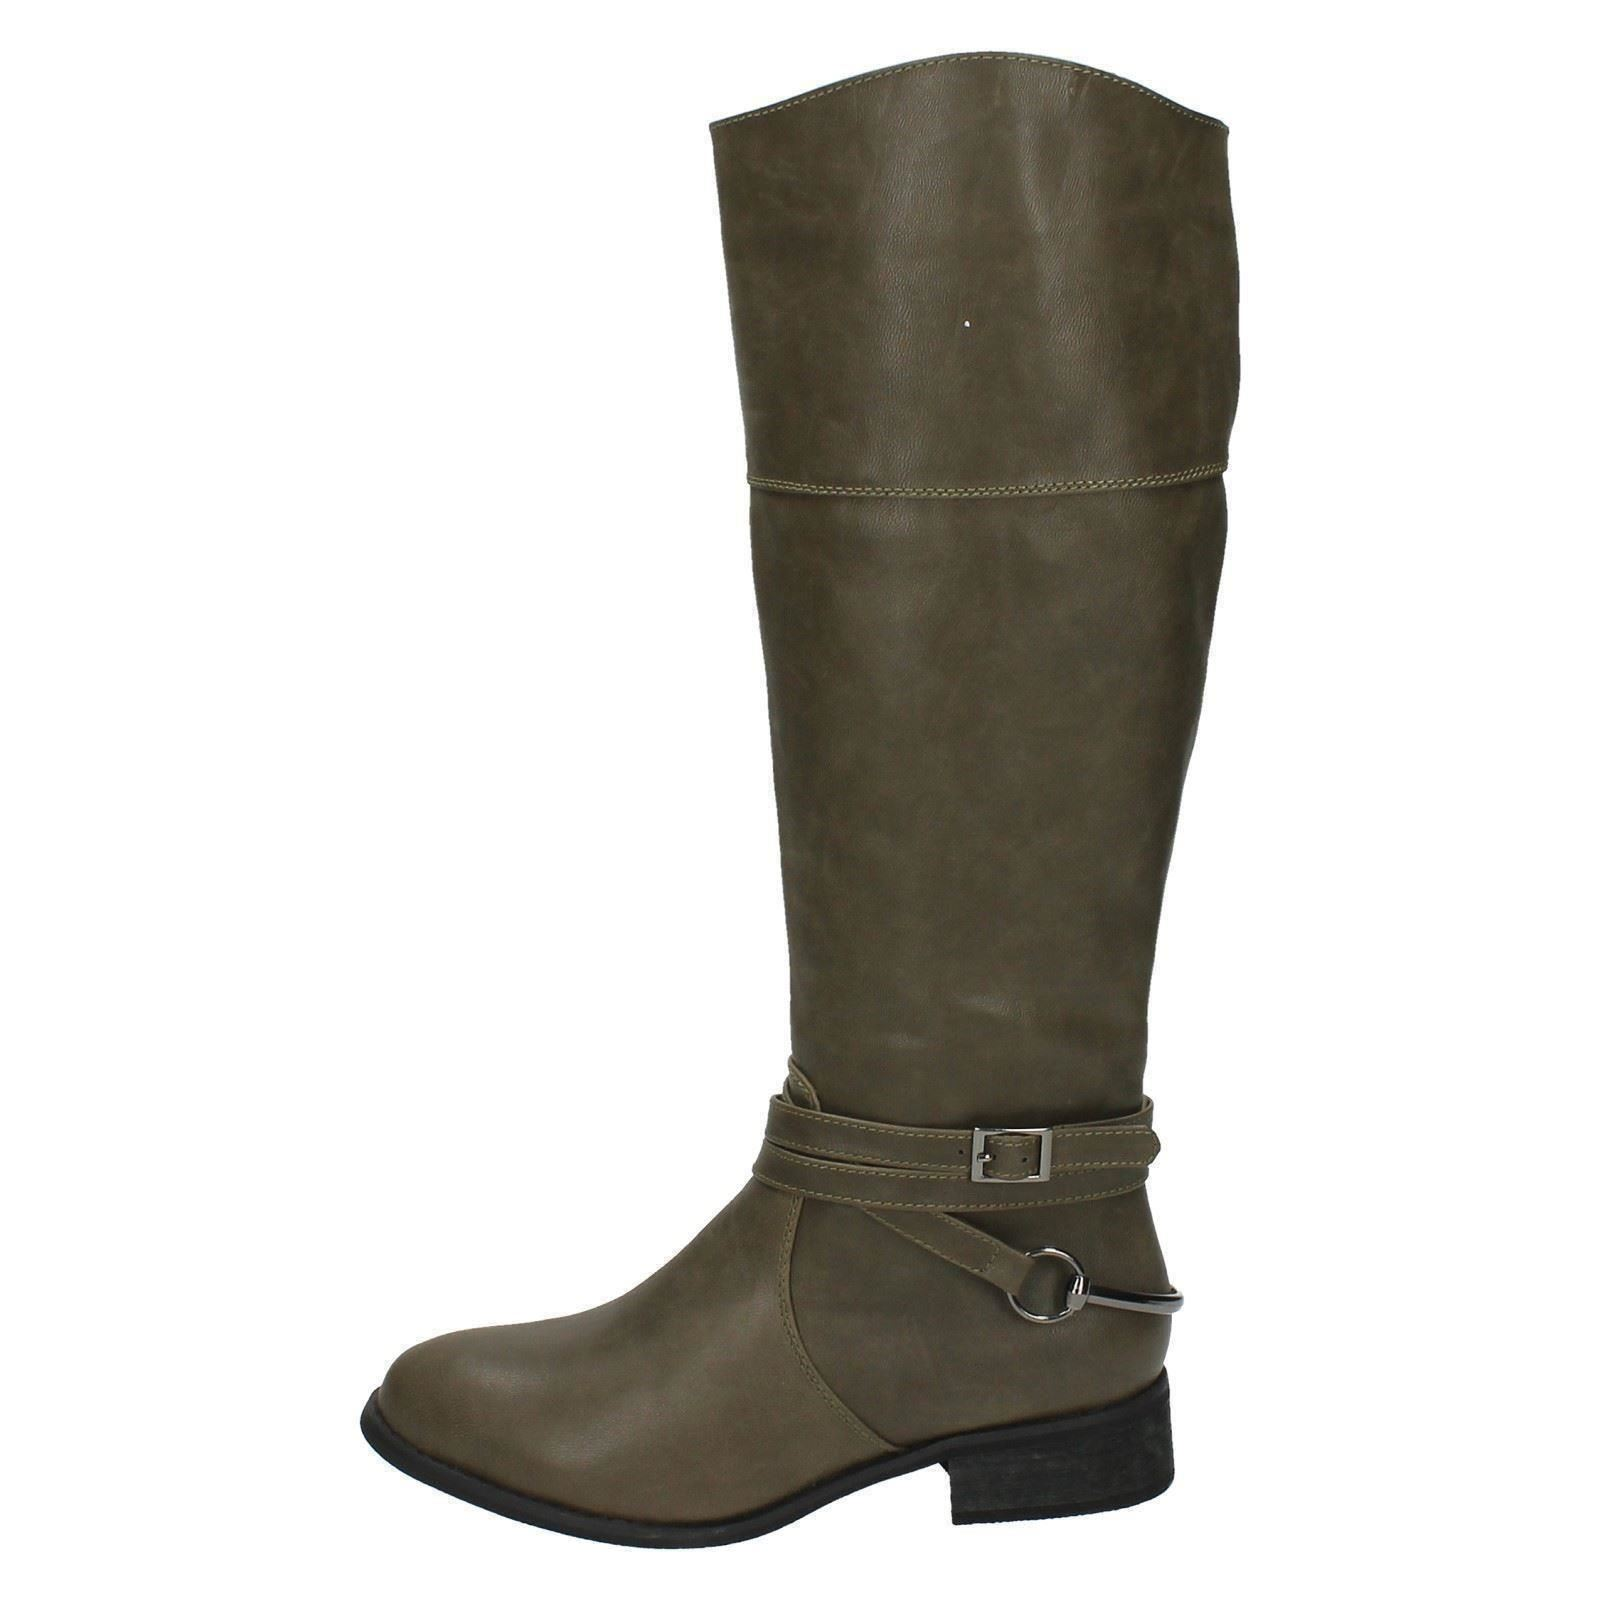 Ladies-Spot-On-Long-Boot-F50159-N